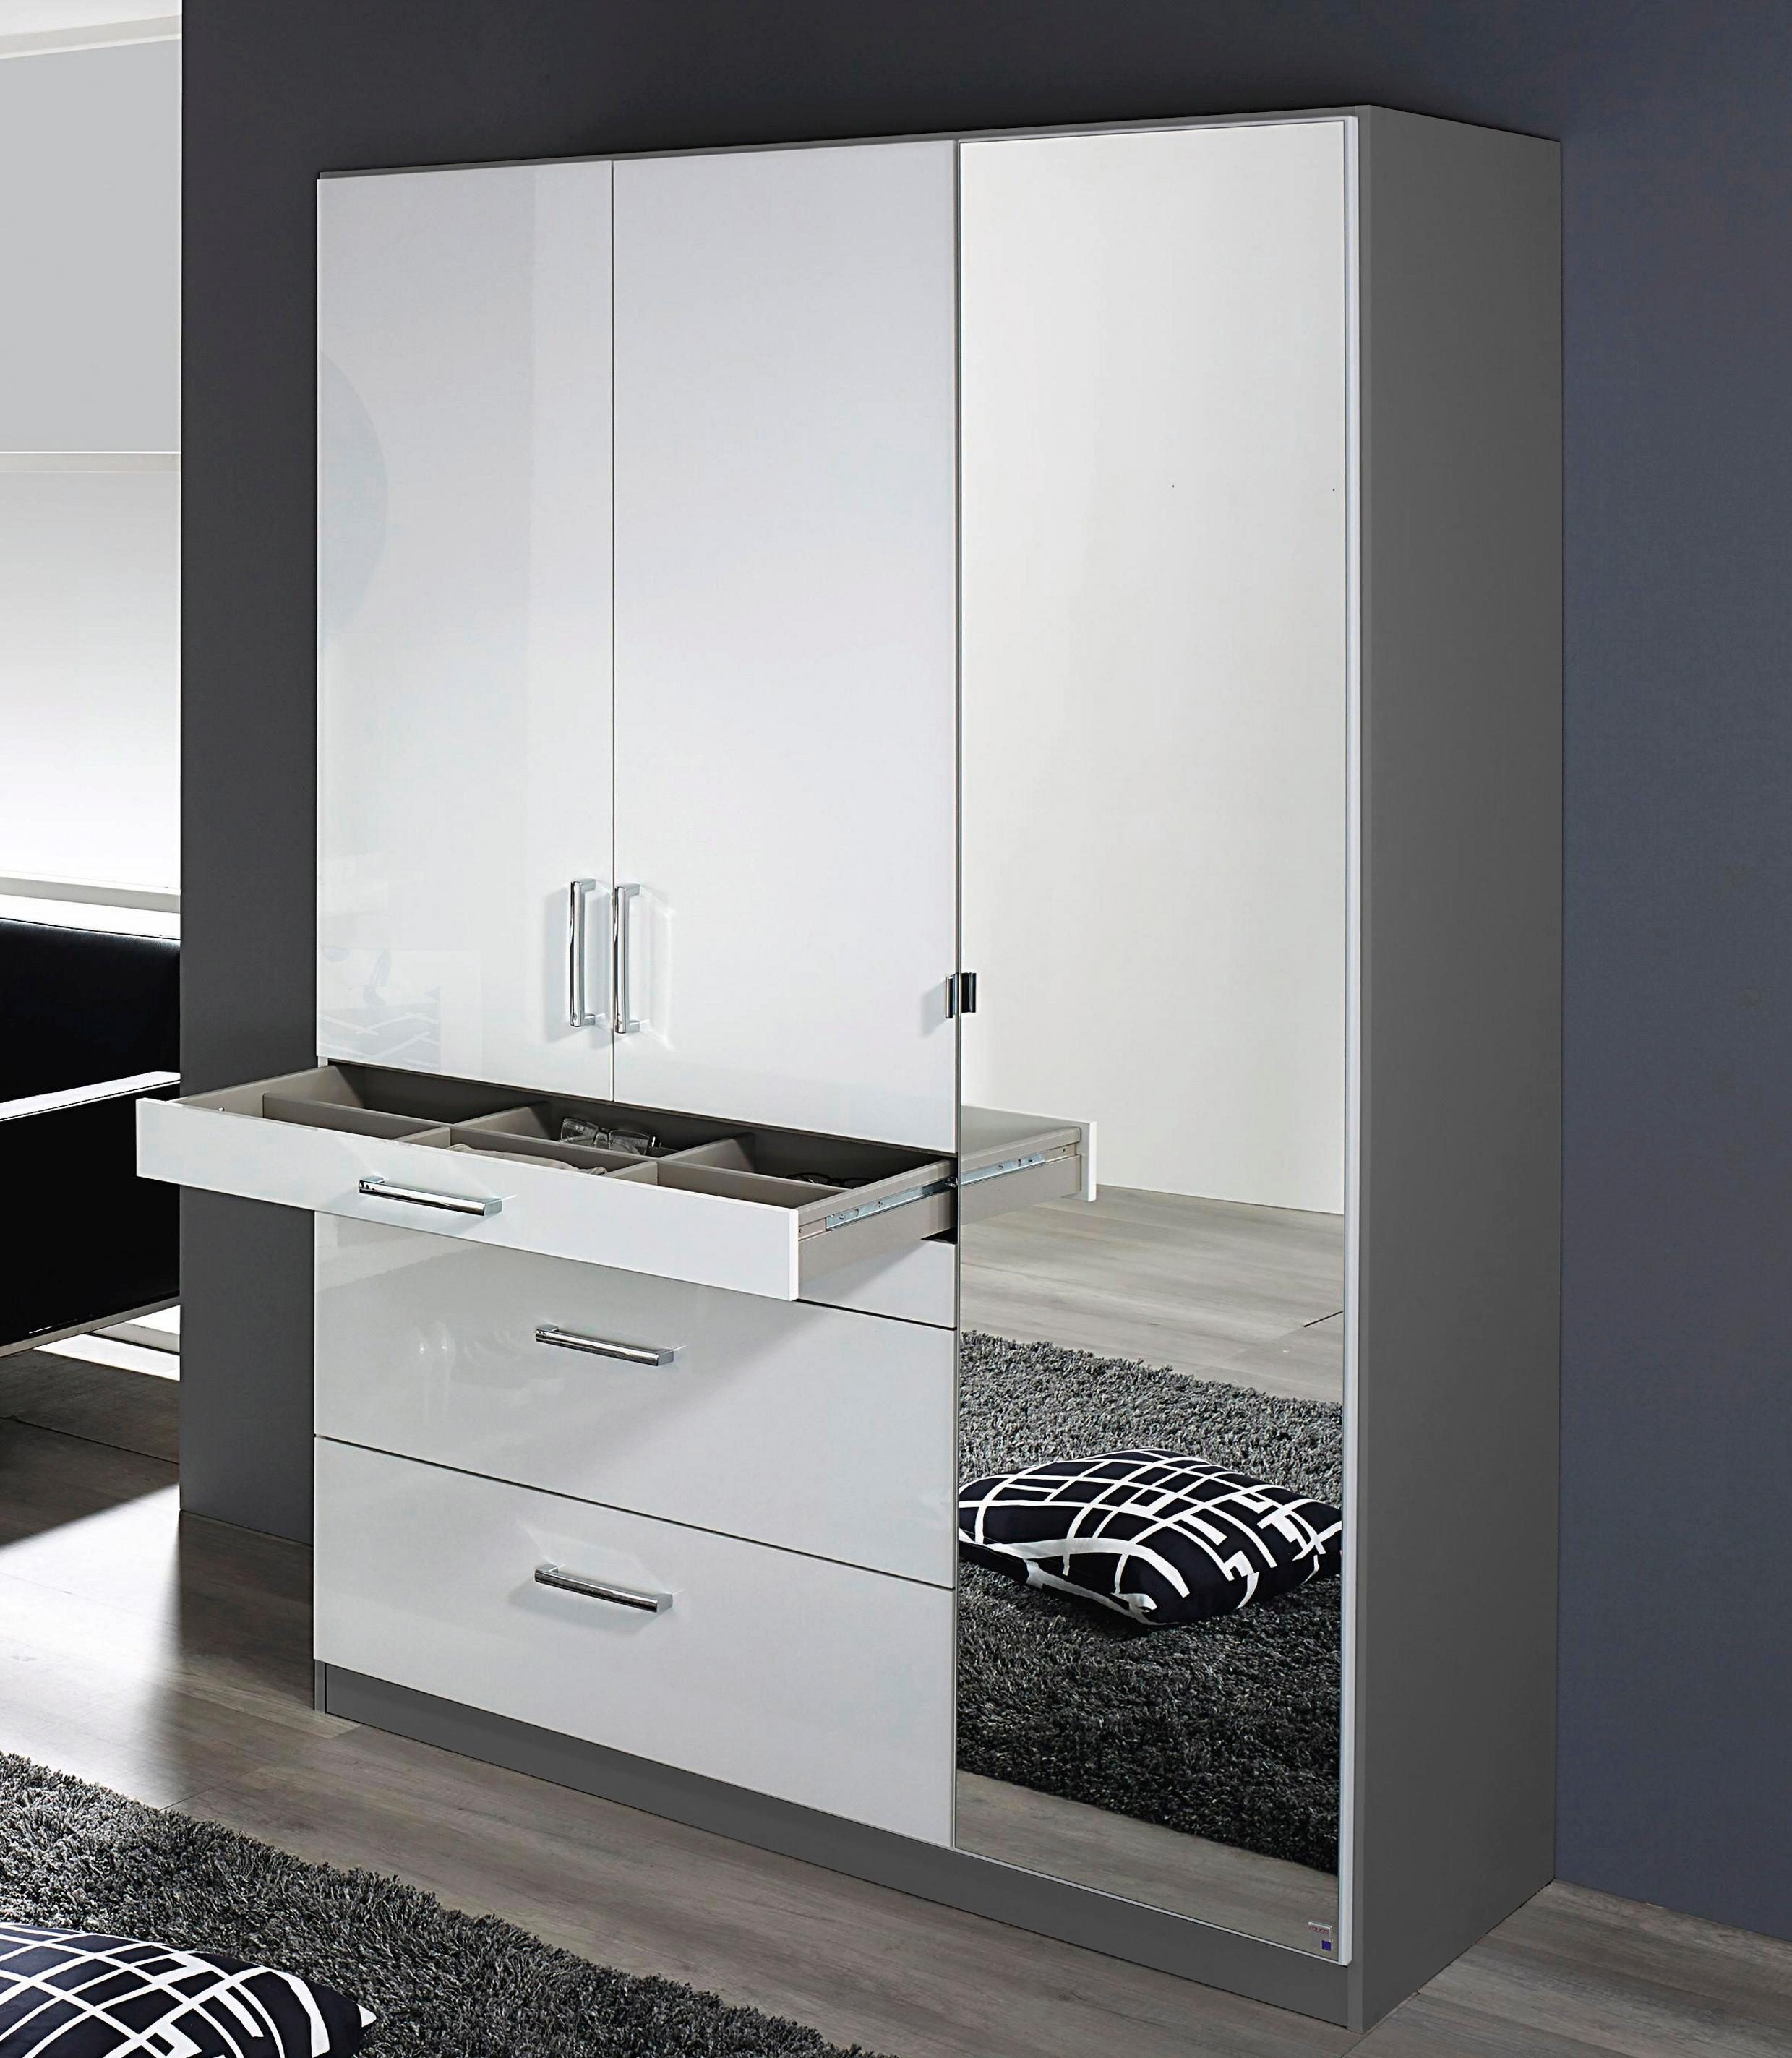 griffe fuer kueche ideen f r die wohnraumgestaltung. Black Bedroom Furniture Sets. Home Design Ideas